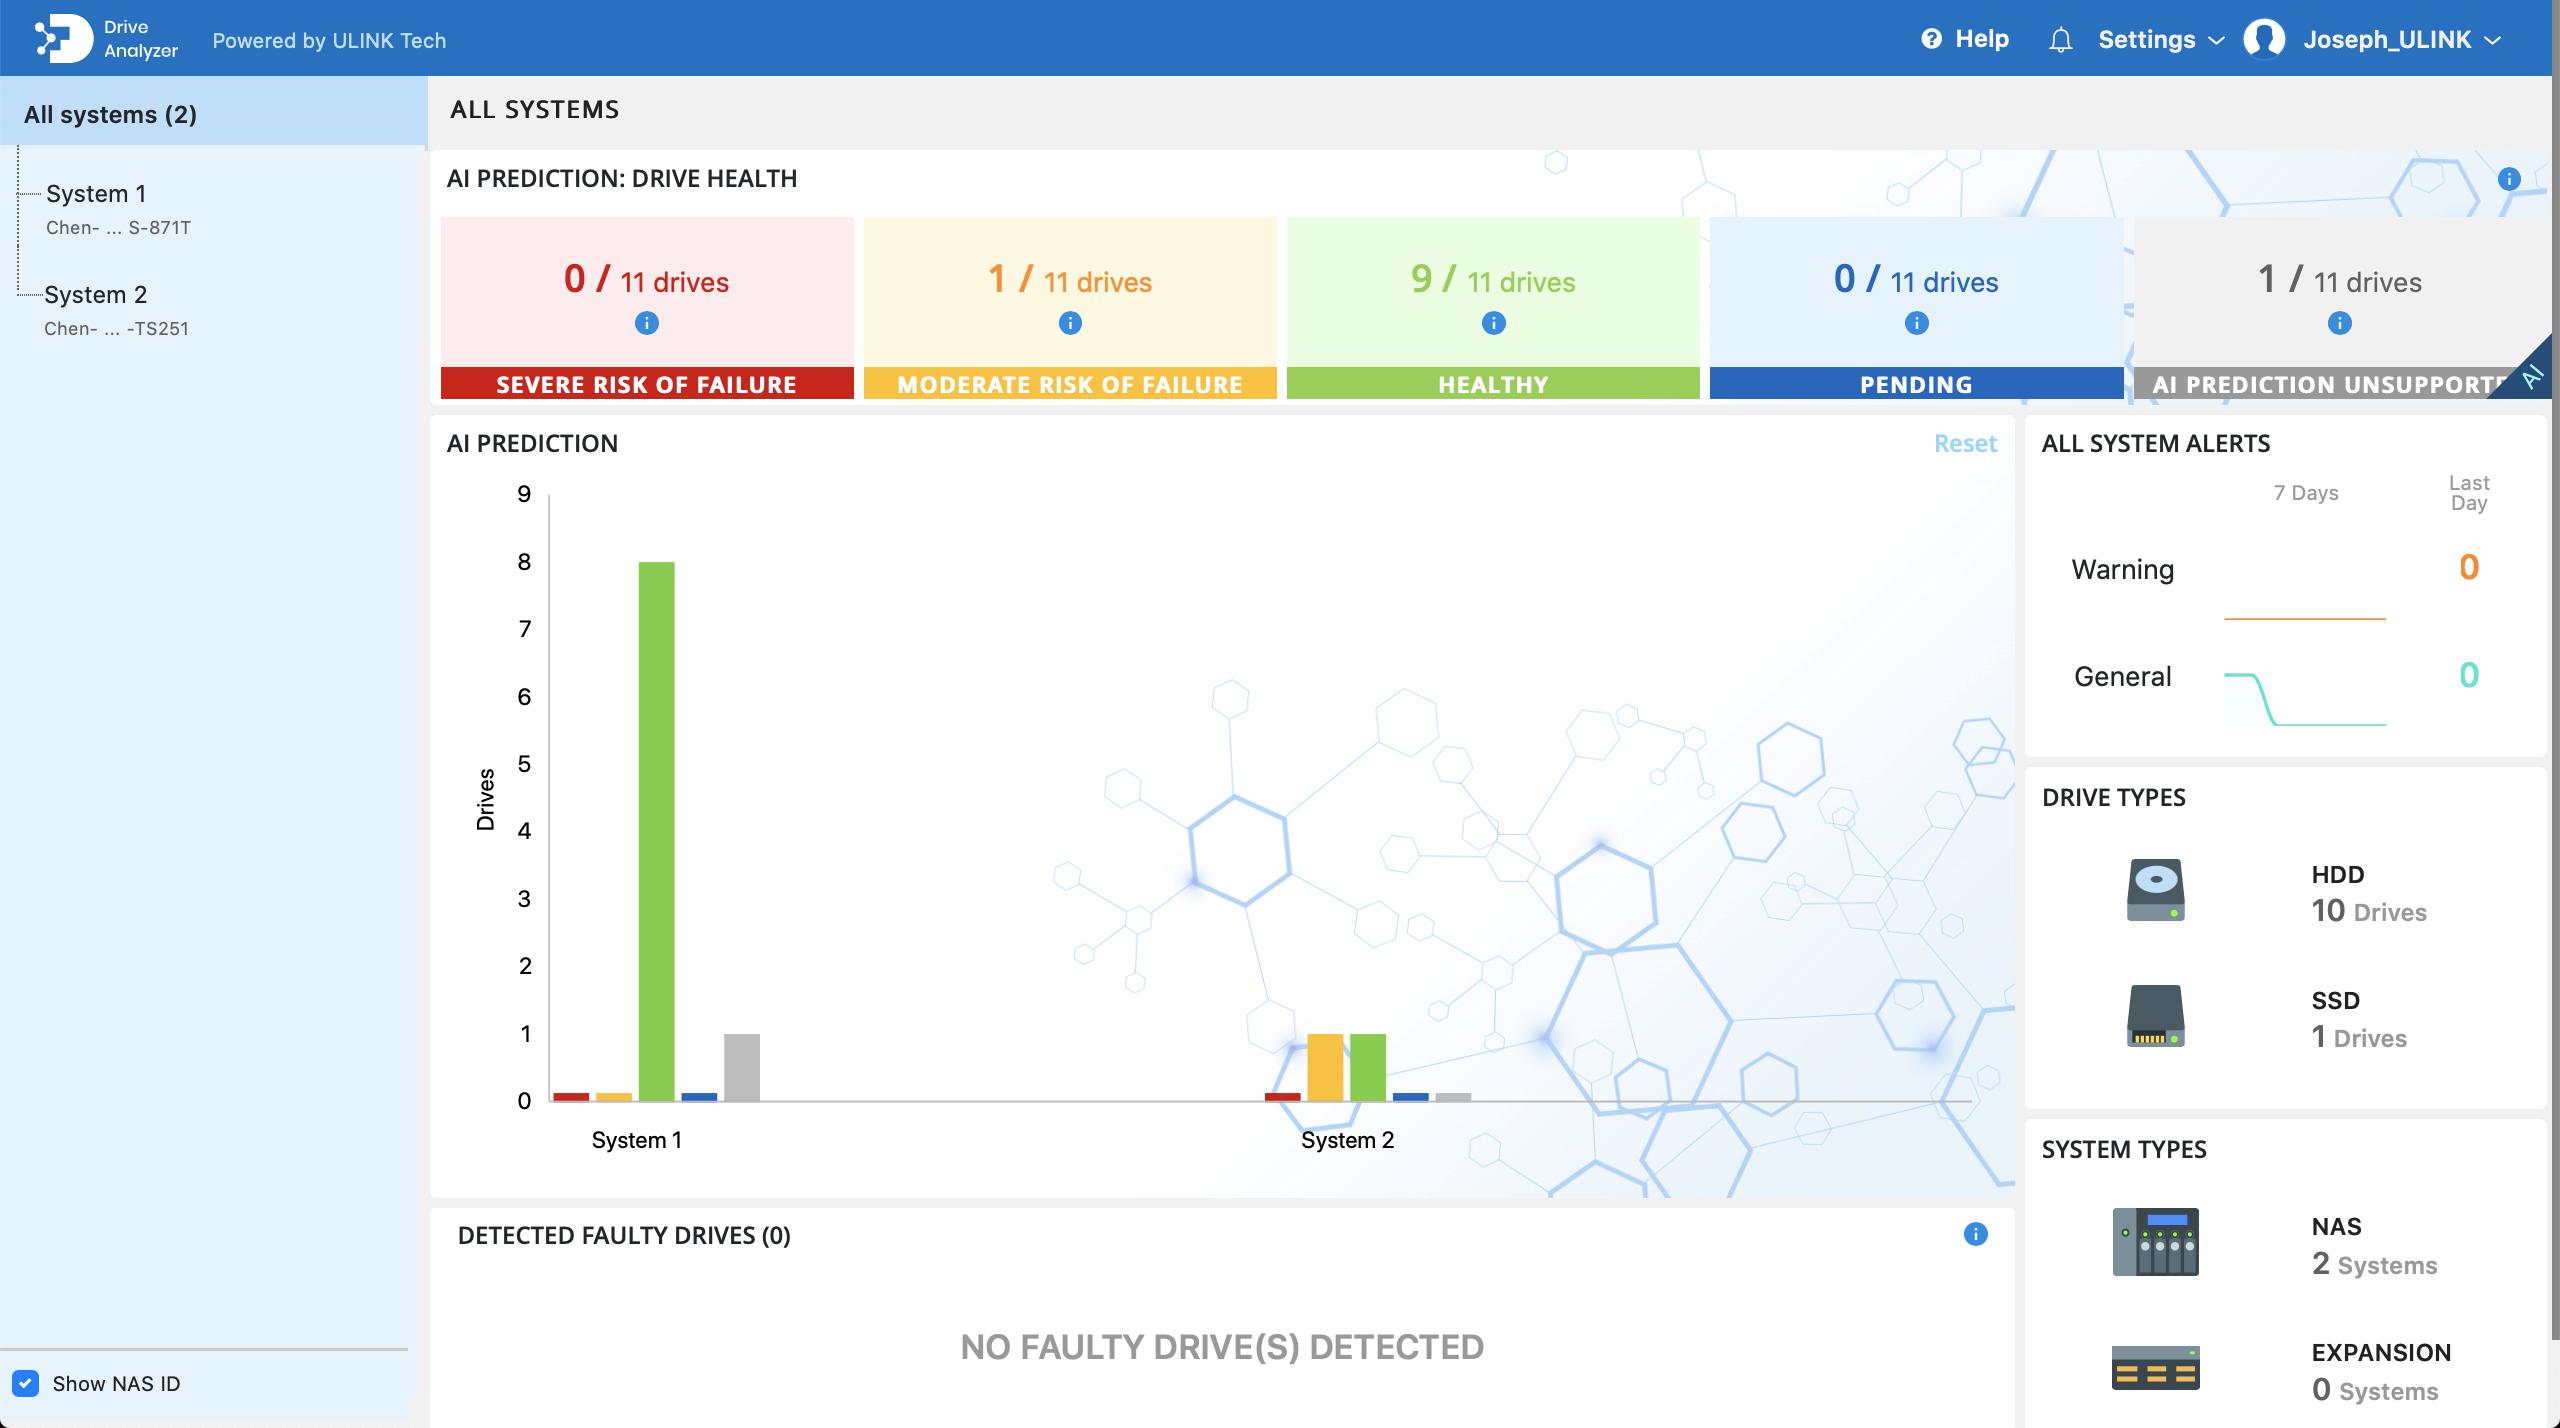 screenshot_allsystemview